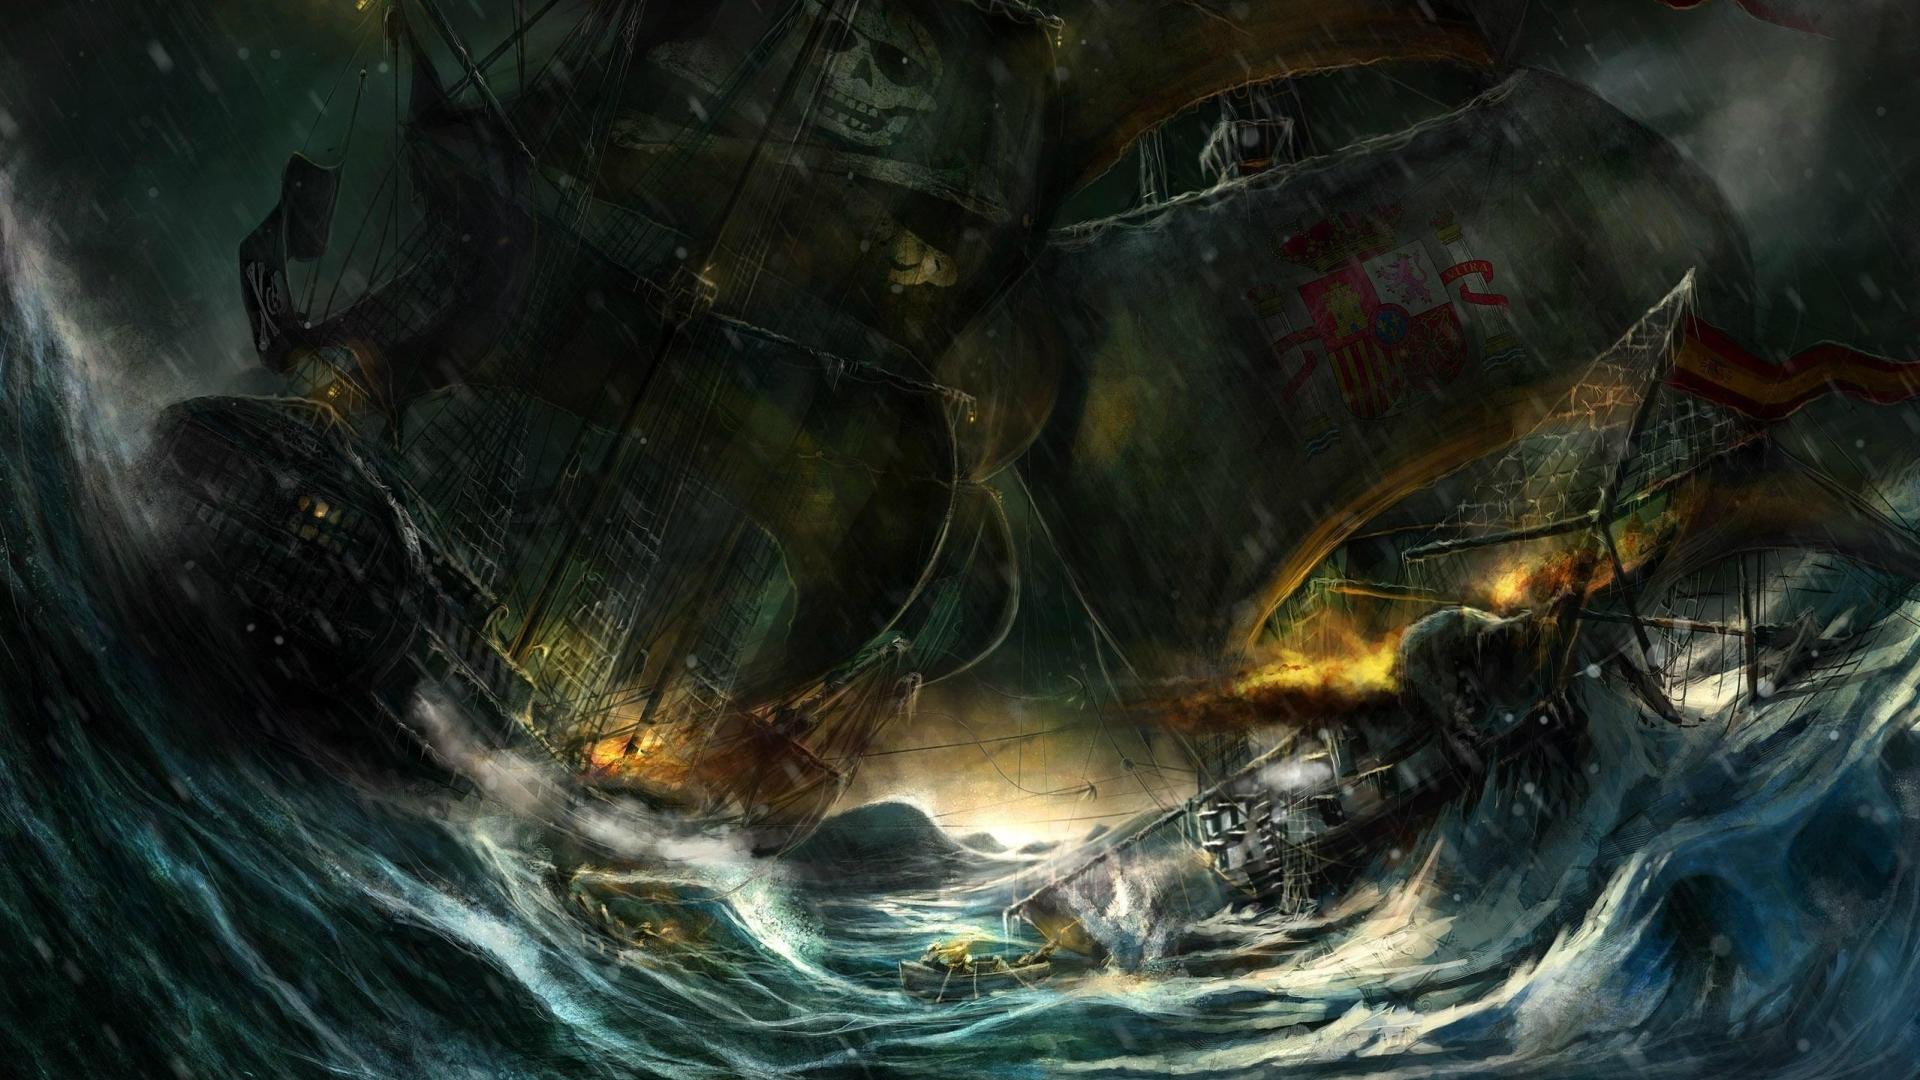 ship wallpaper hd free download